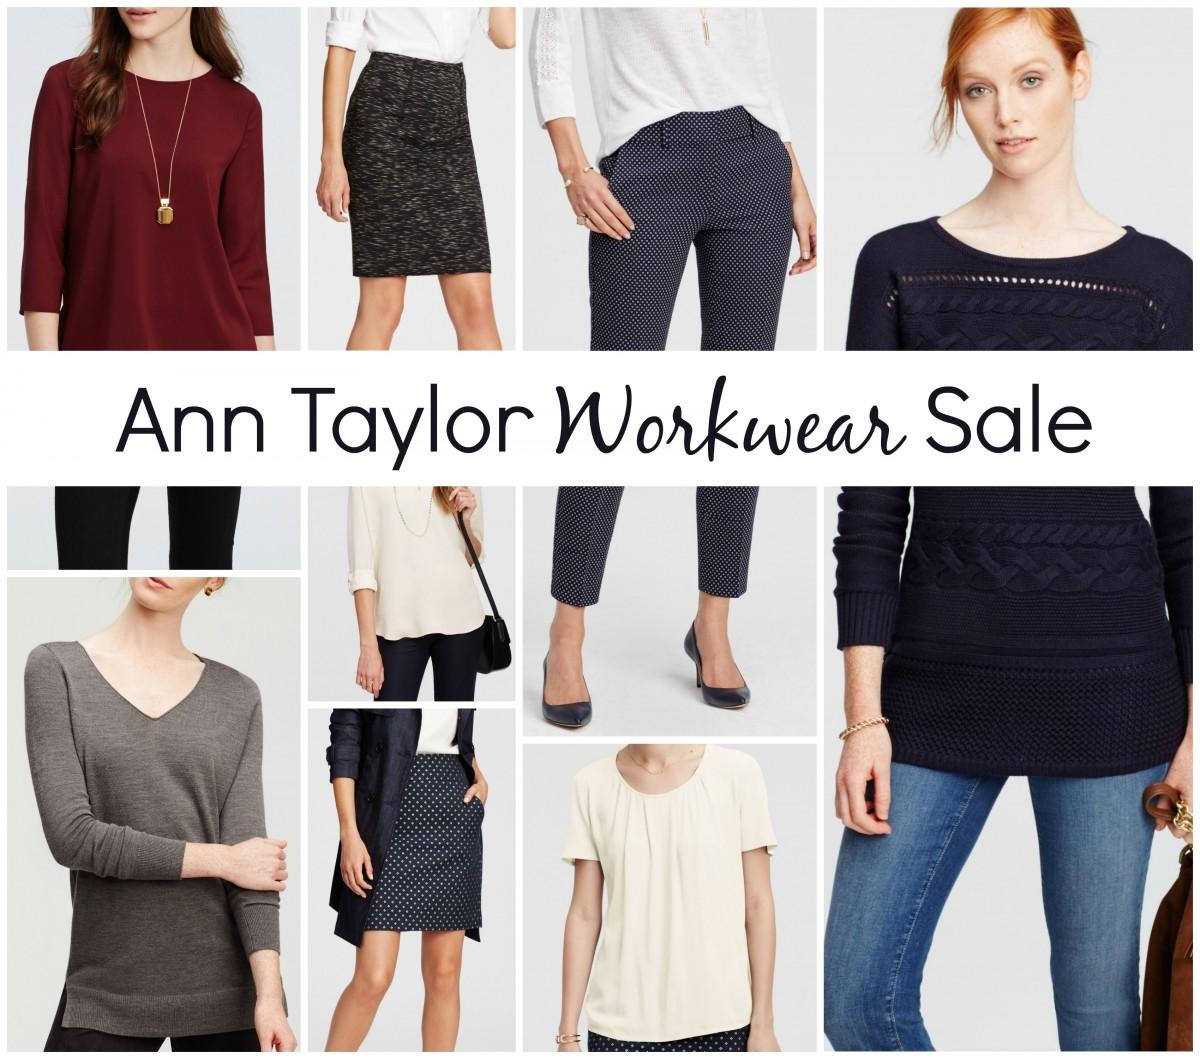 Ann Taylor Workwear Sale Her Heartland Soul